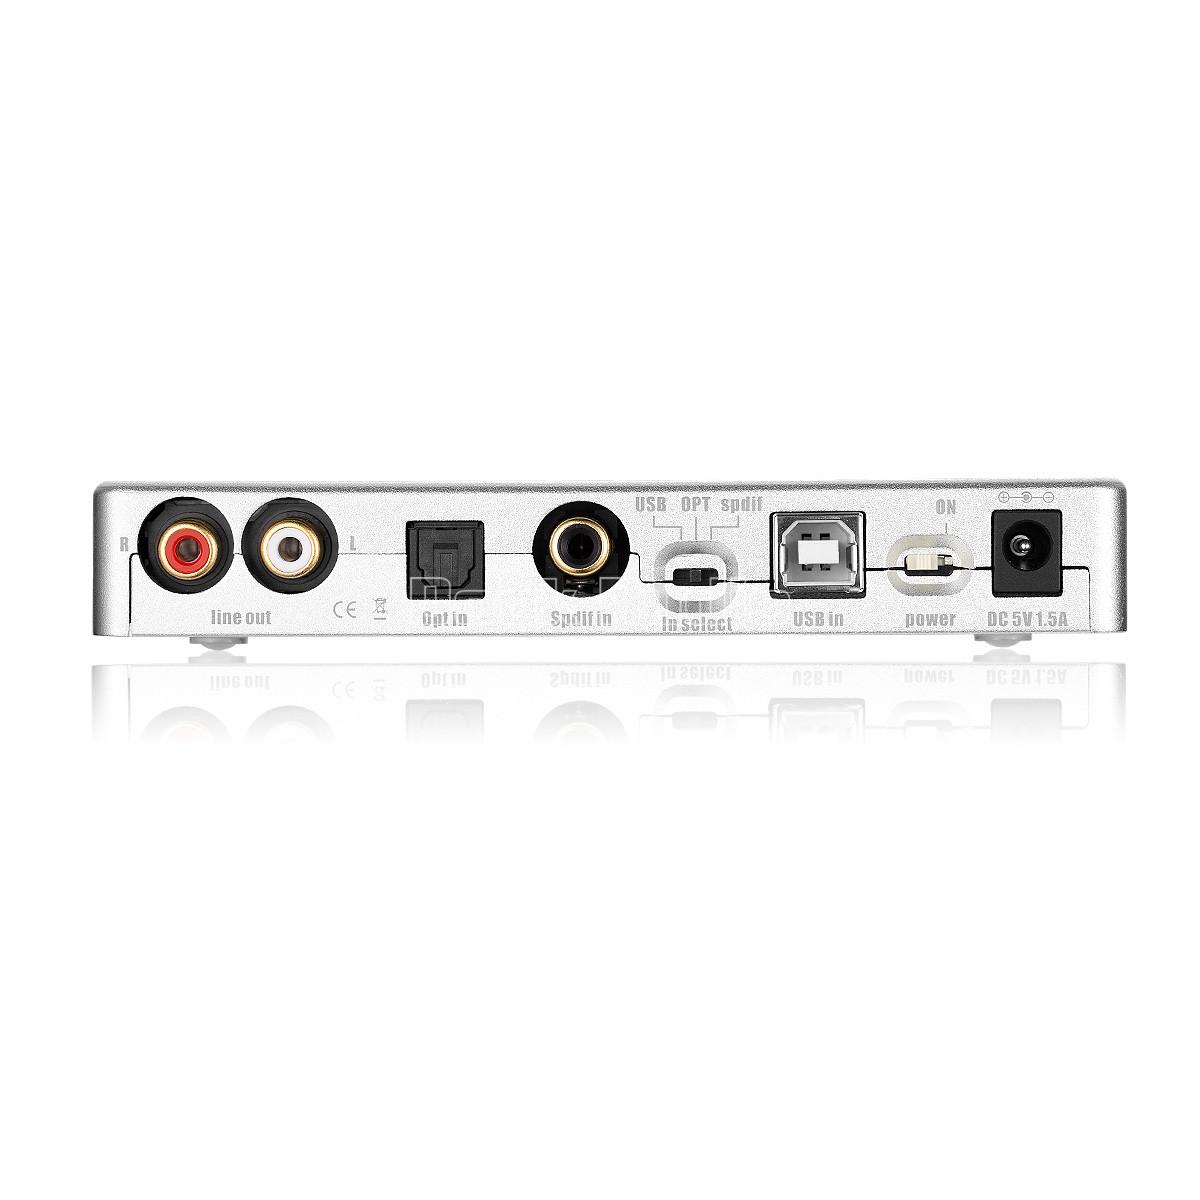 Nobsound Dsd Hifi Audio Decoder Xmos Dac Usb Coaxial Optical Pcm384k Dsd256